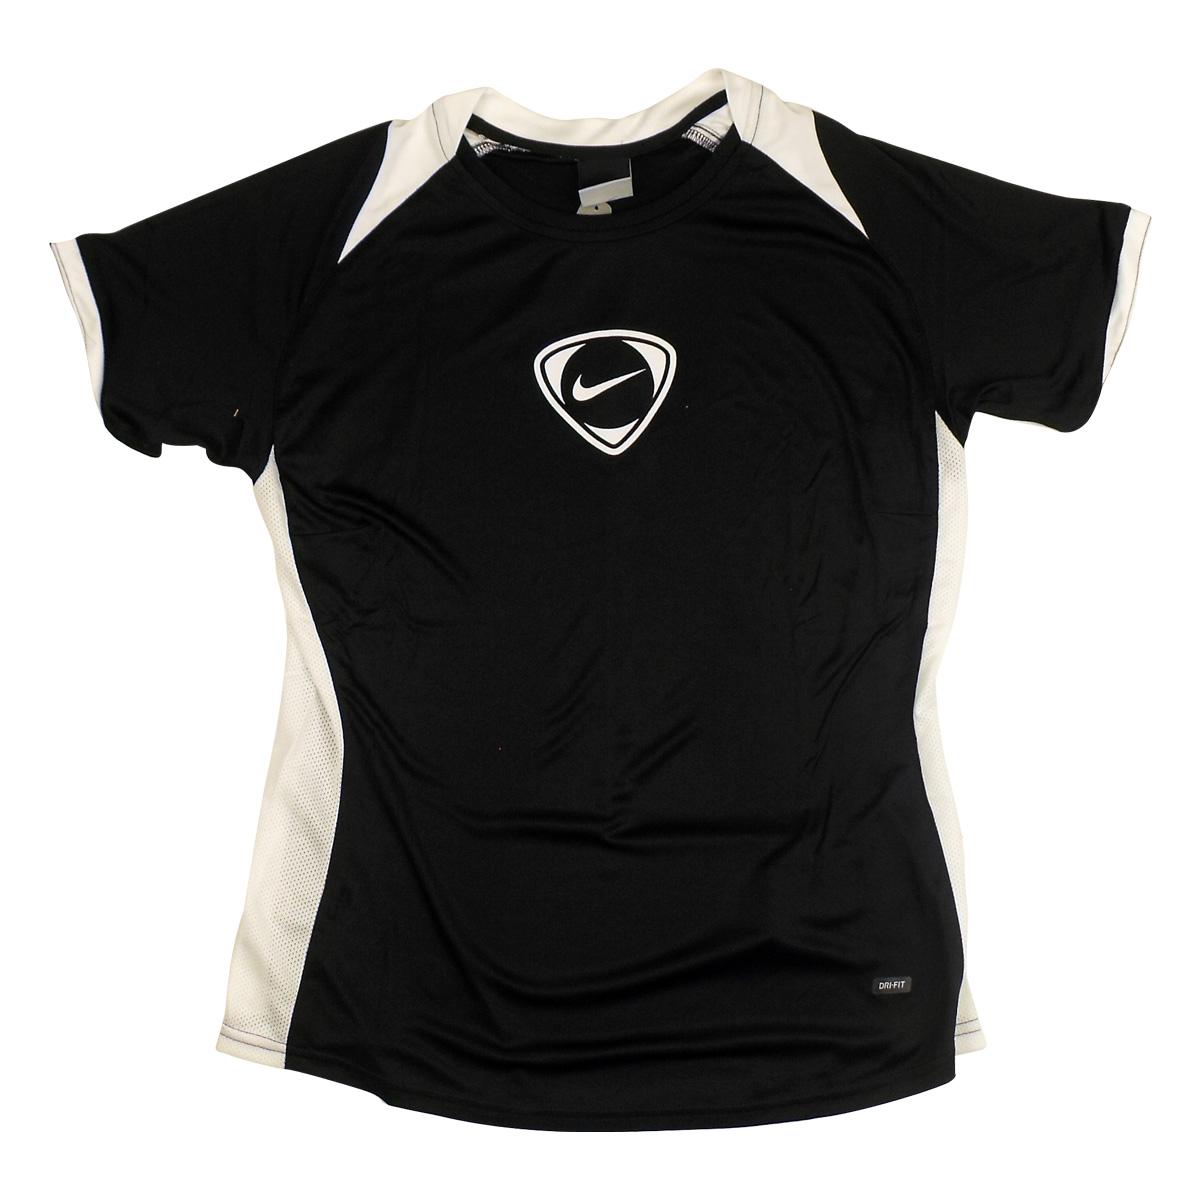 Womens Nike Dry Dri FIT Running Shirt Vest Top Tee Ladies ...